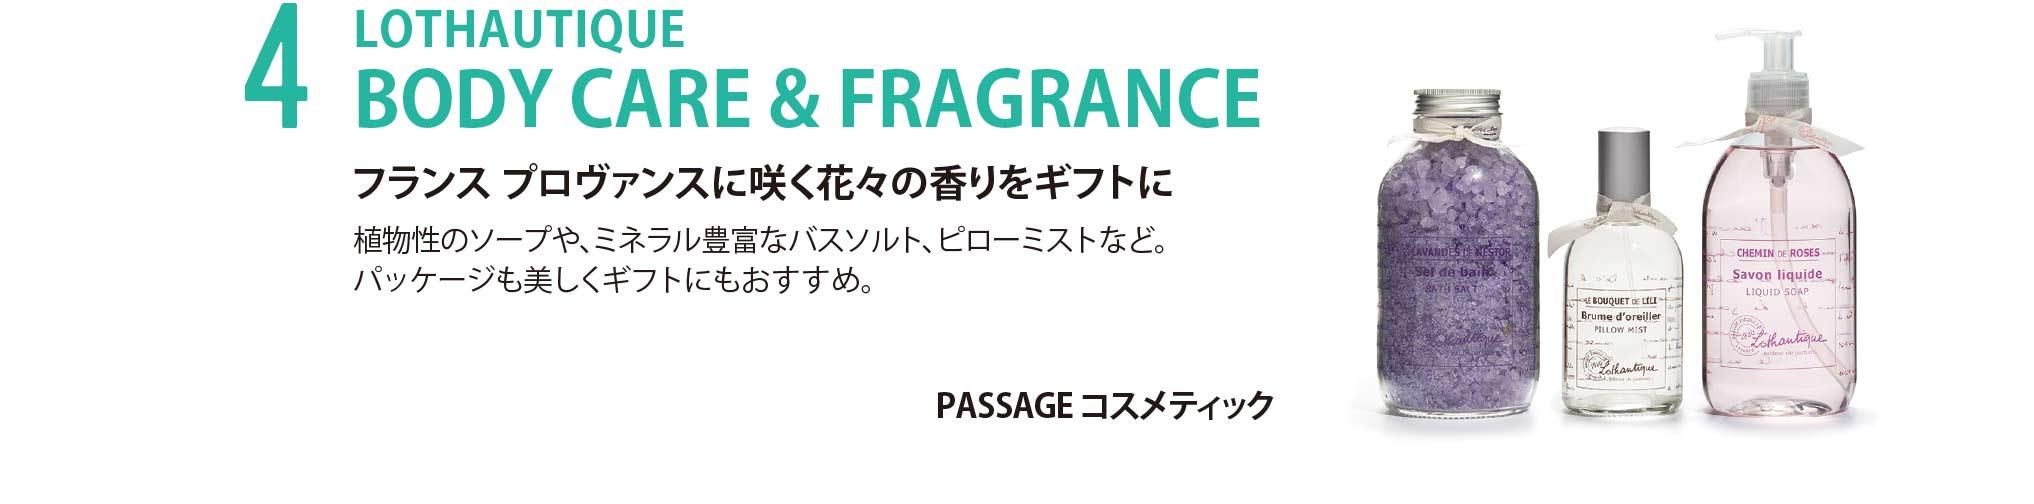 BODY CARE & FRAGRANCE フランス プロヴァンスに咲く花々の香りをギフトに